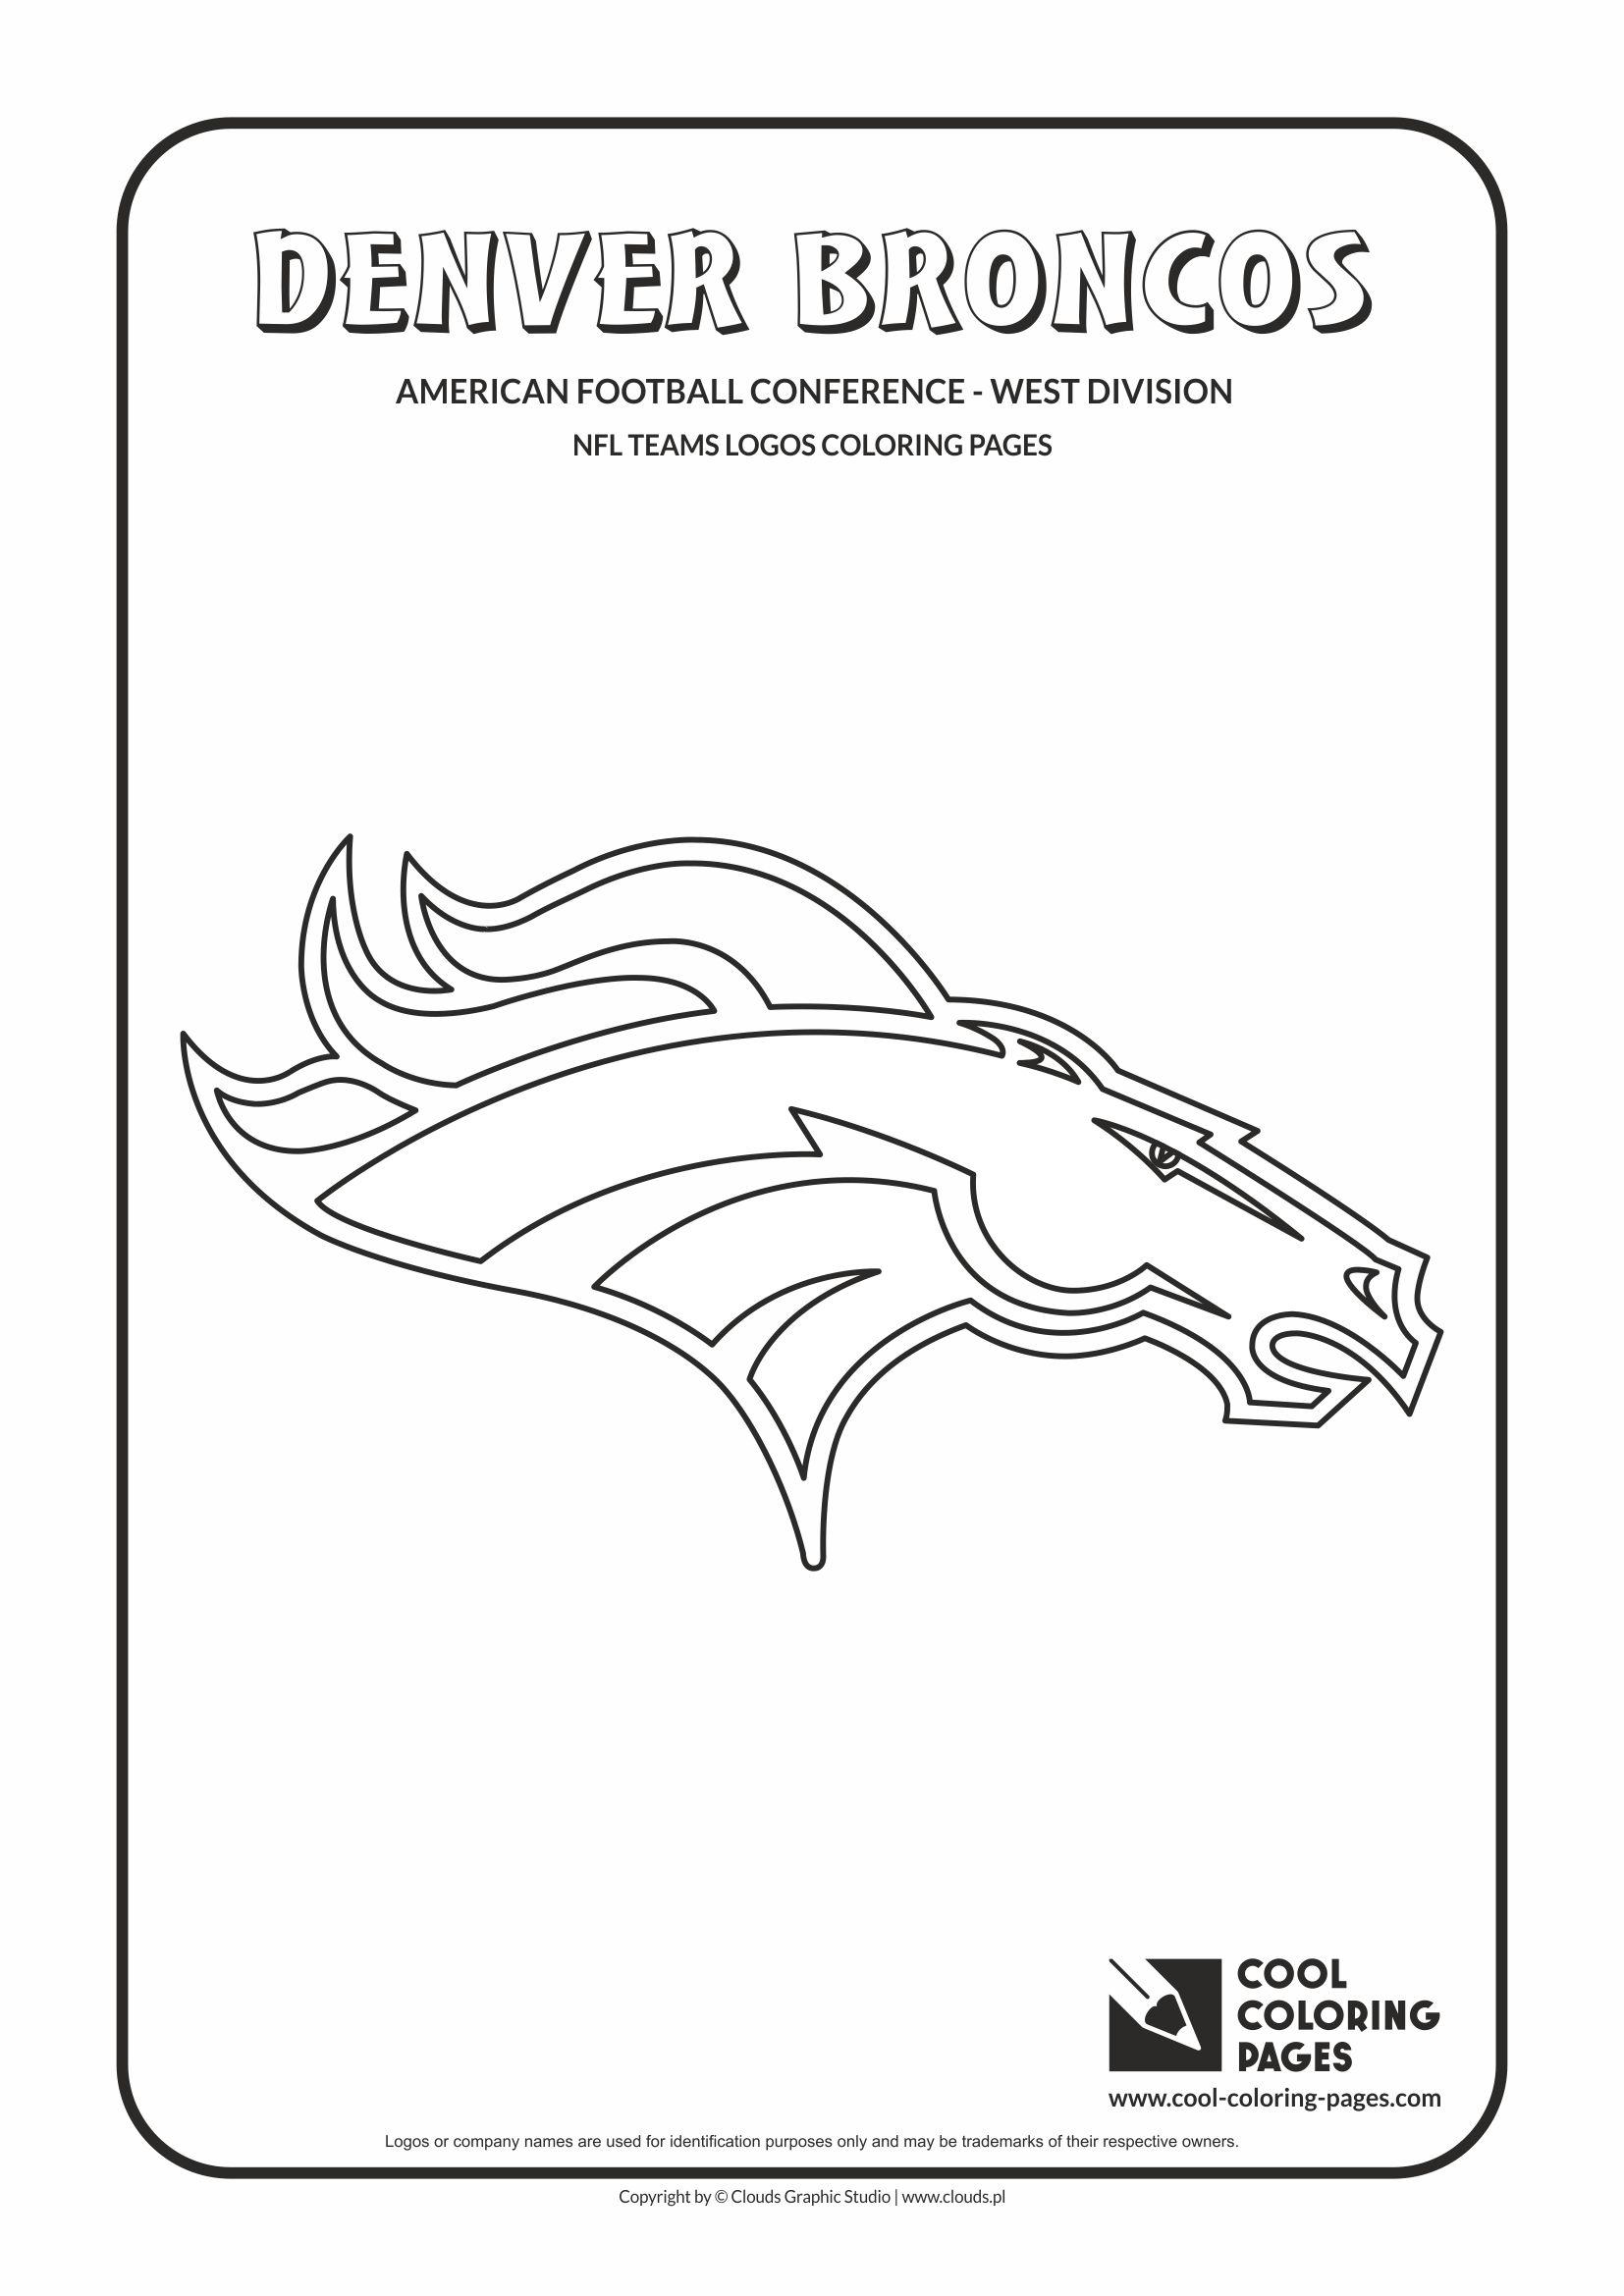 100 ideas Broncos Coloring Pages on gerardduchemann